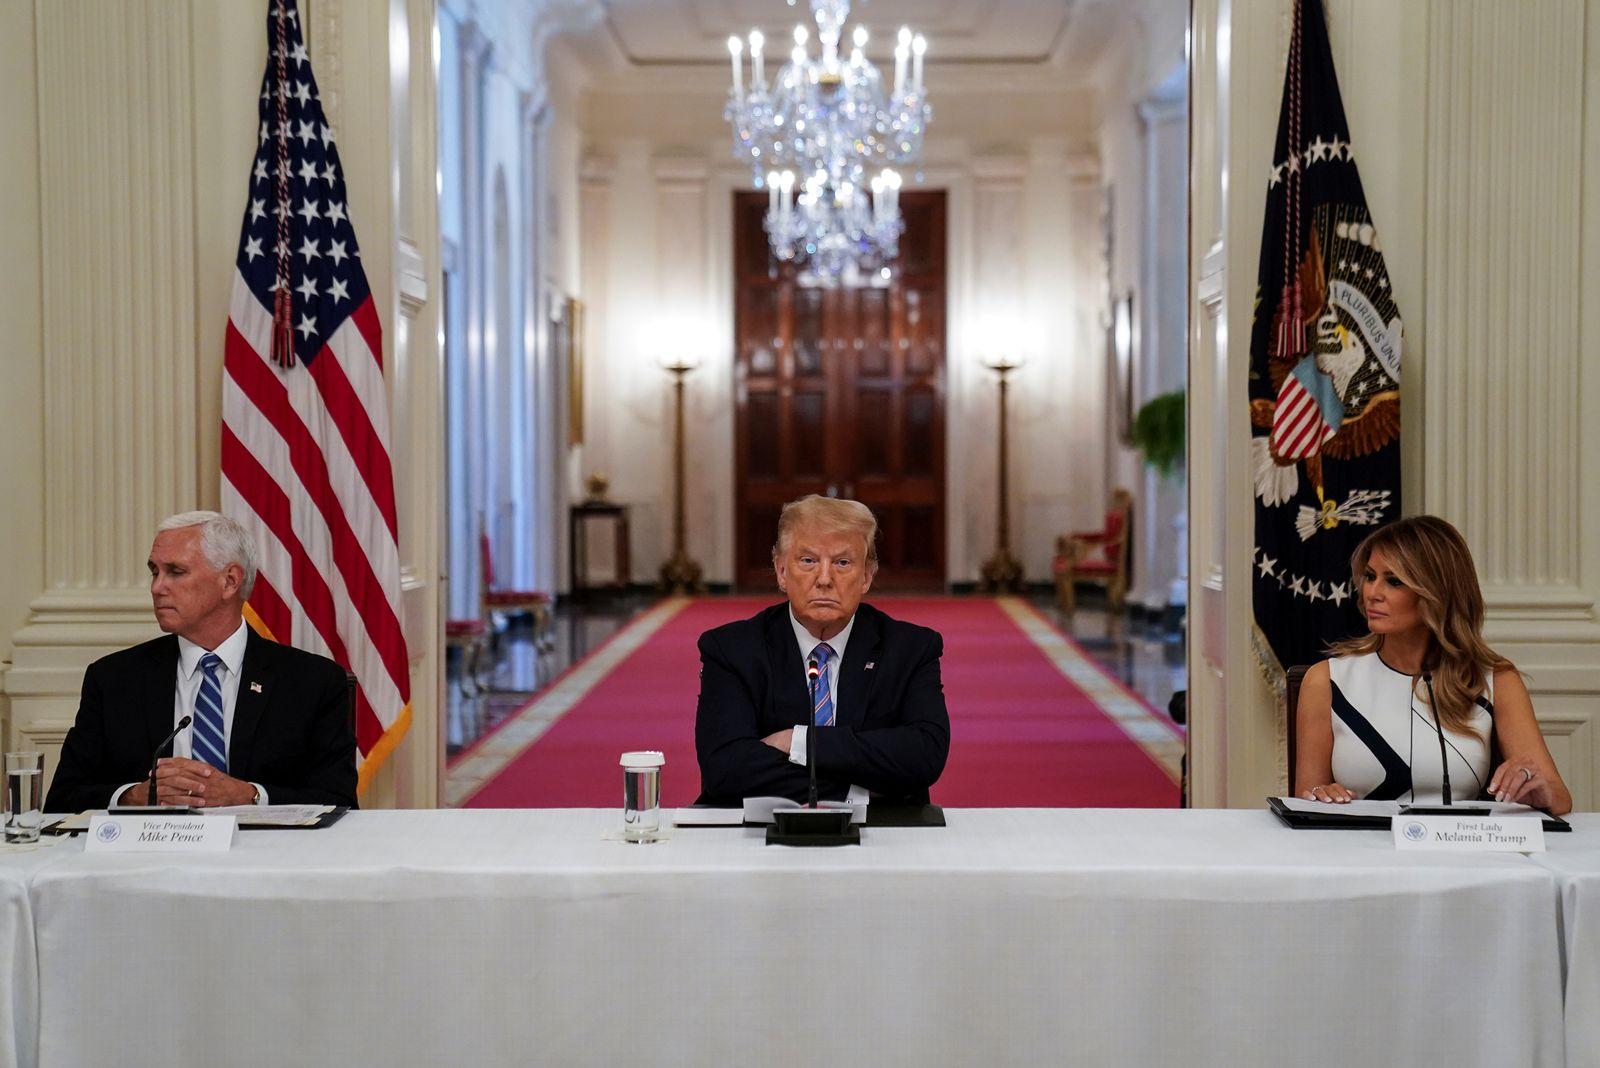 U.S. President Trump hosts coronavirus response event on reopening schools at the White House in Washington